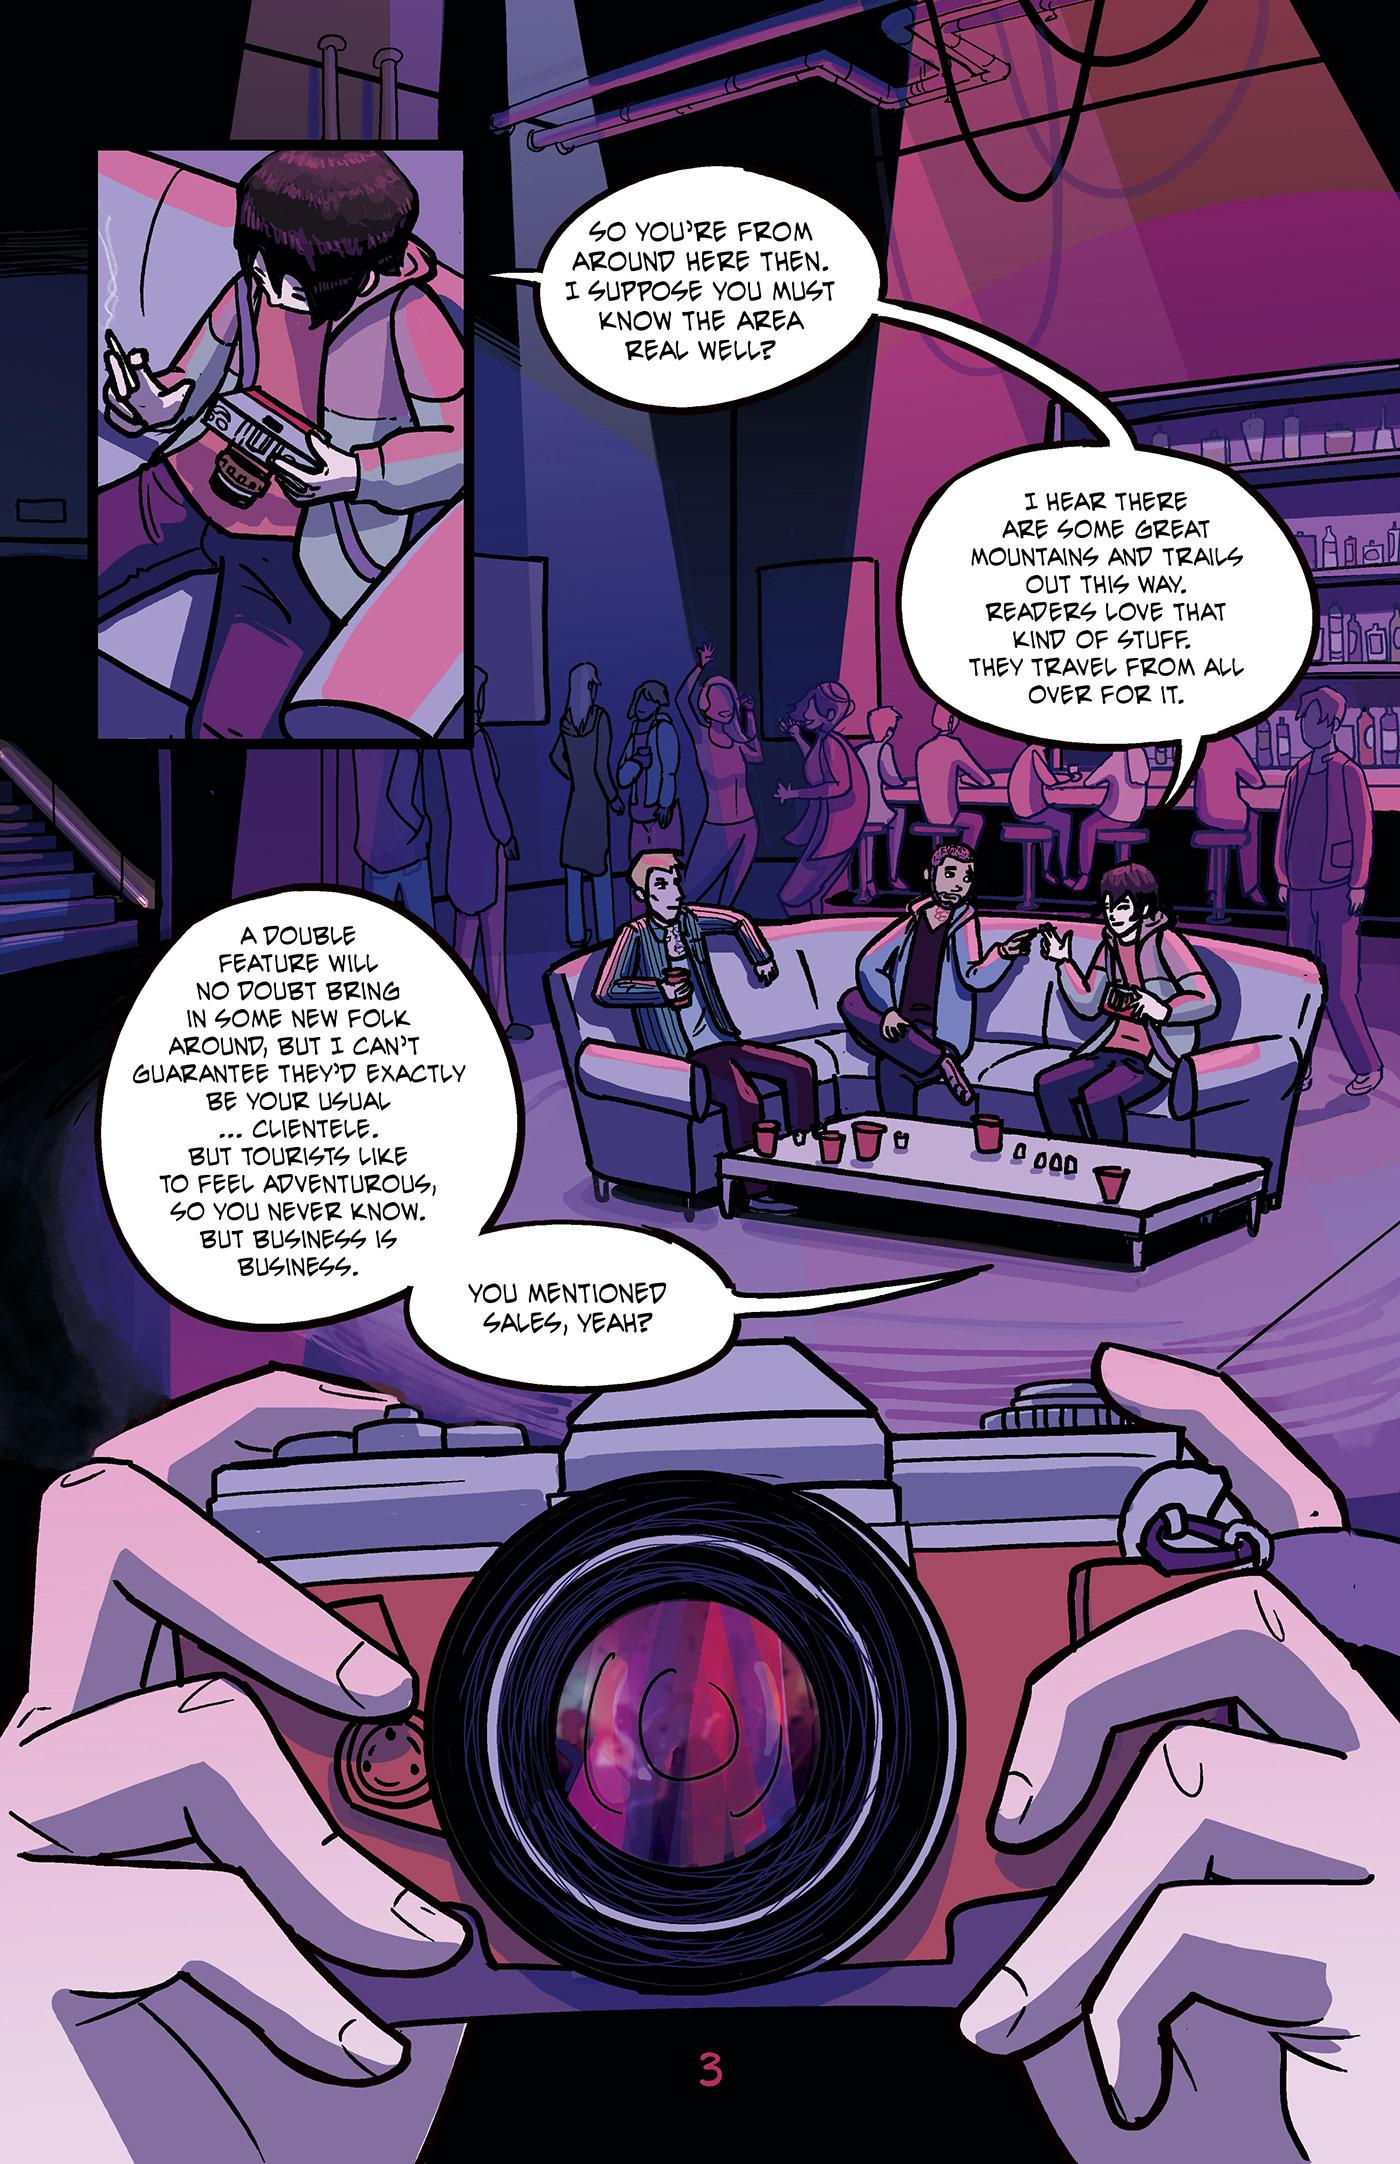 comics original comics suspense comic Suspense Thriller web comics